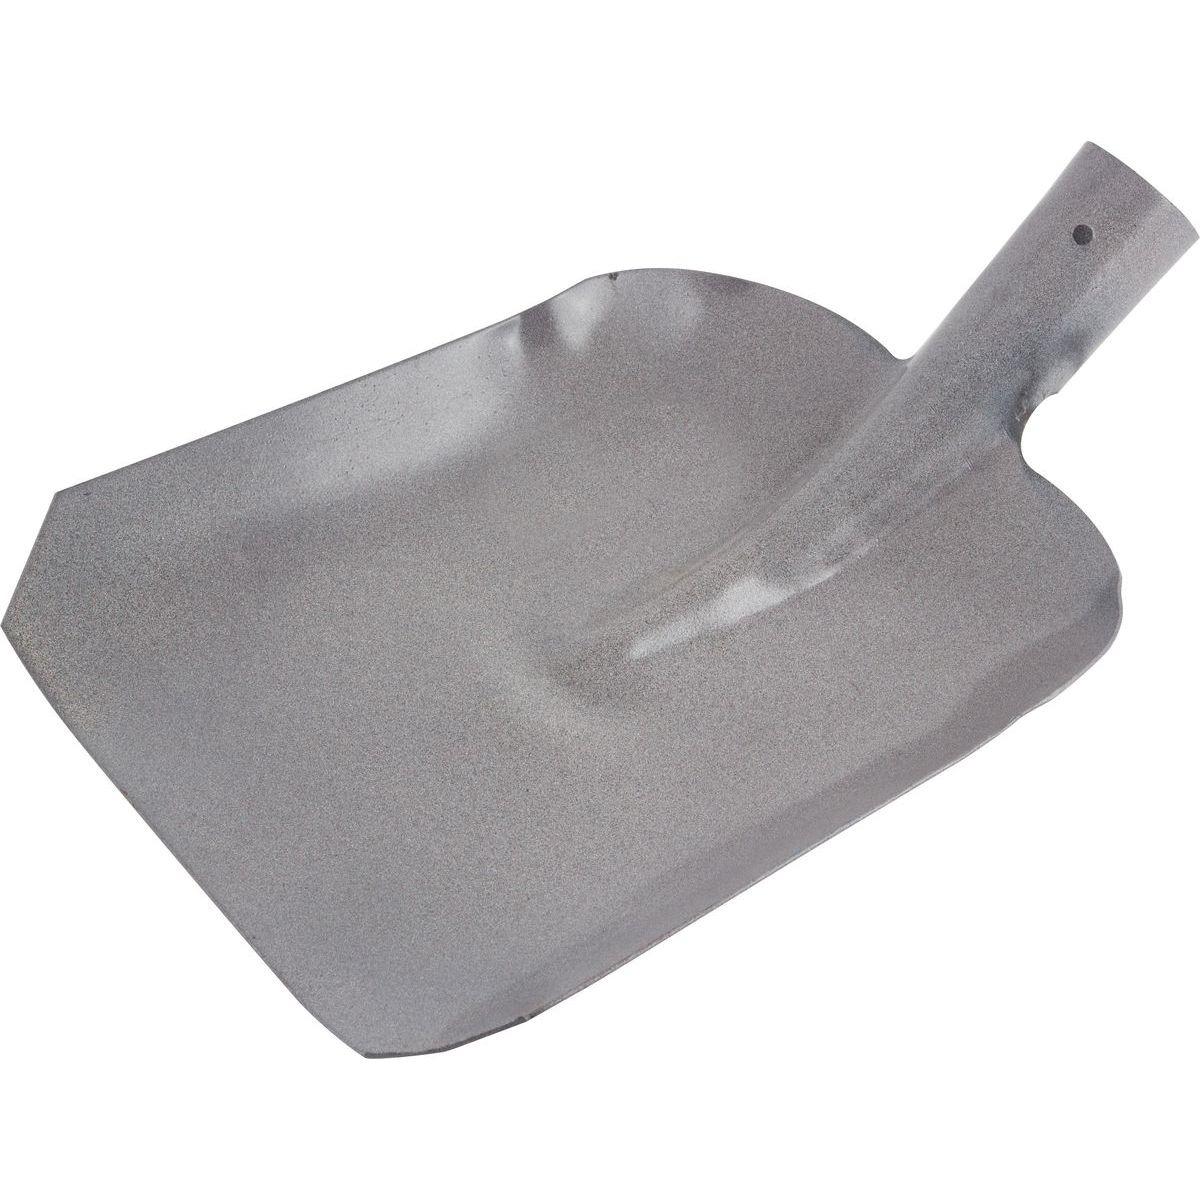 Лопата совковая Агро-инвест, 091480, серый лопата инструм агро умка